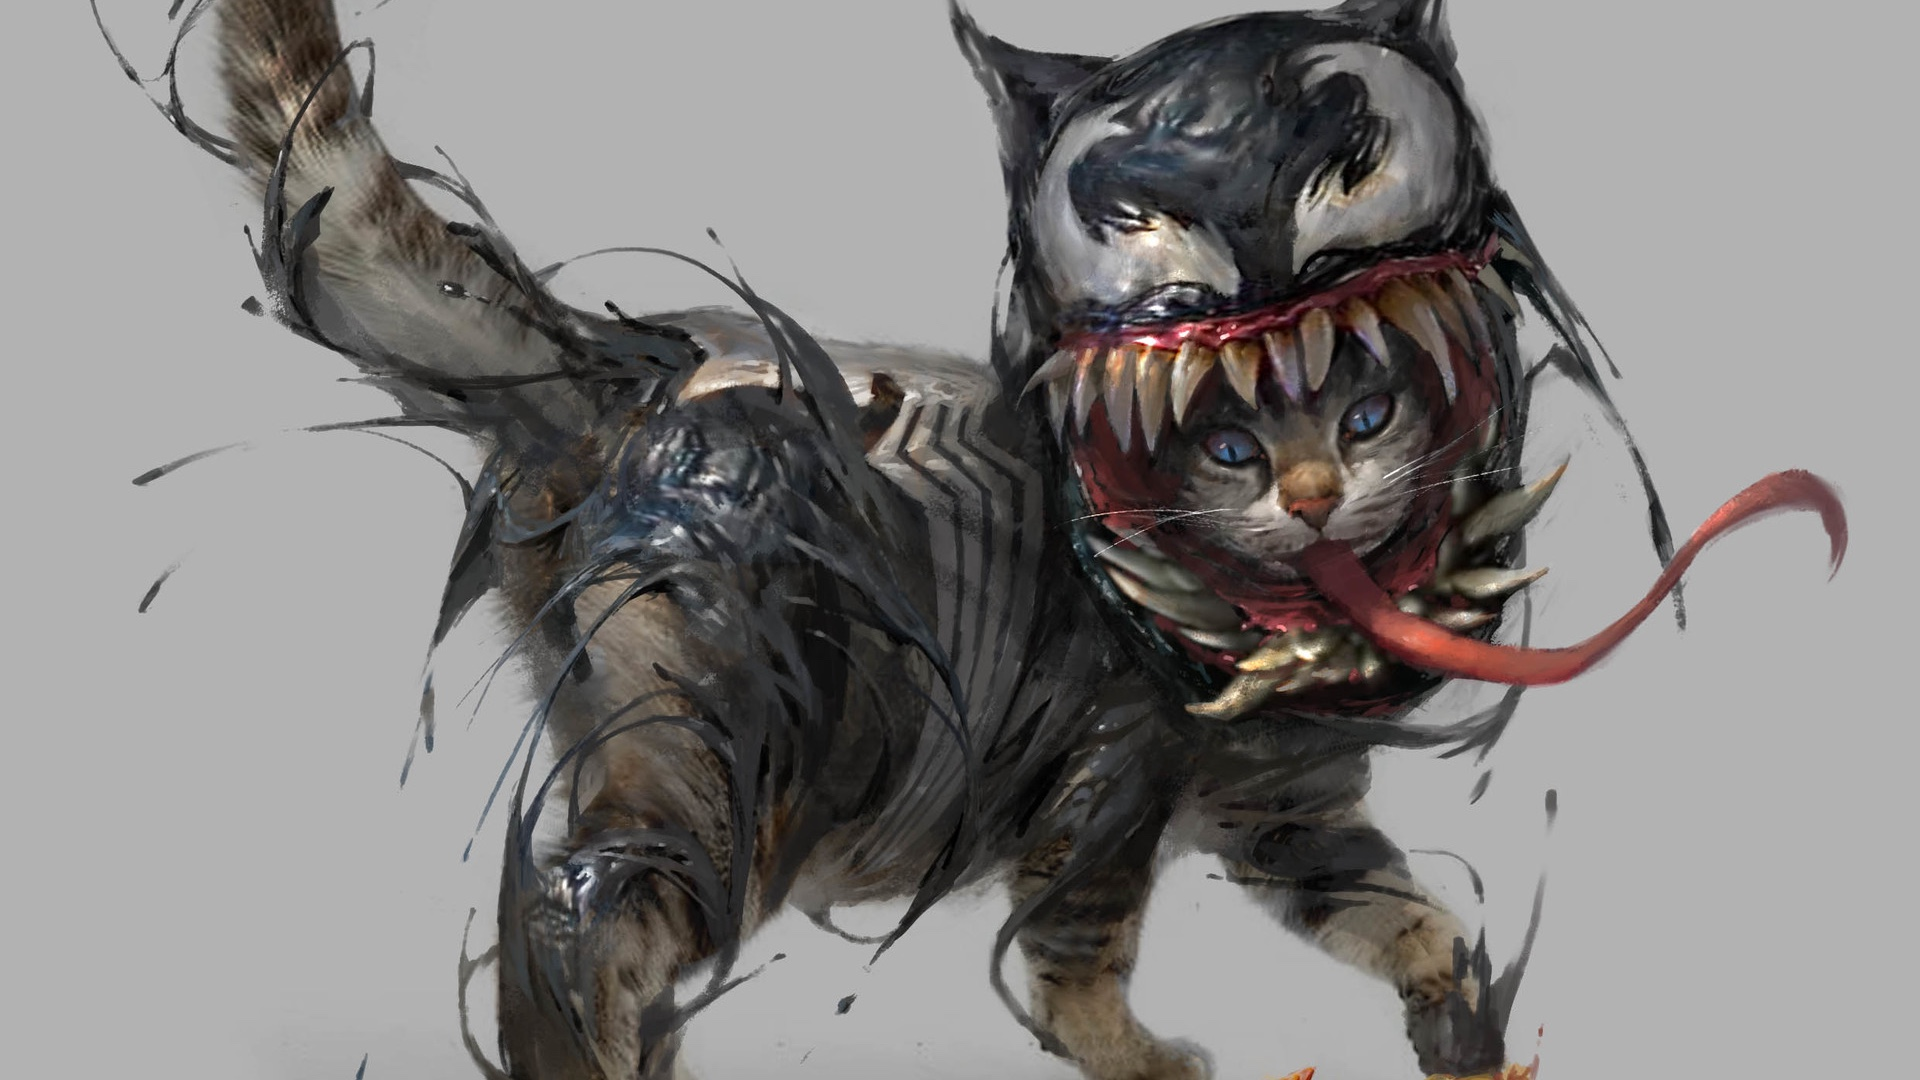 marvel-superheroes-reimagined-as-cats-in-fun-fan-art-series-social.jpg